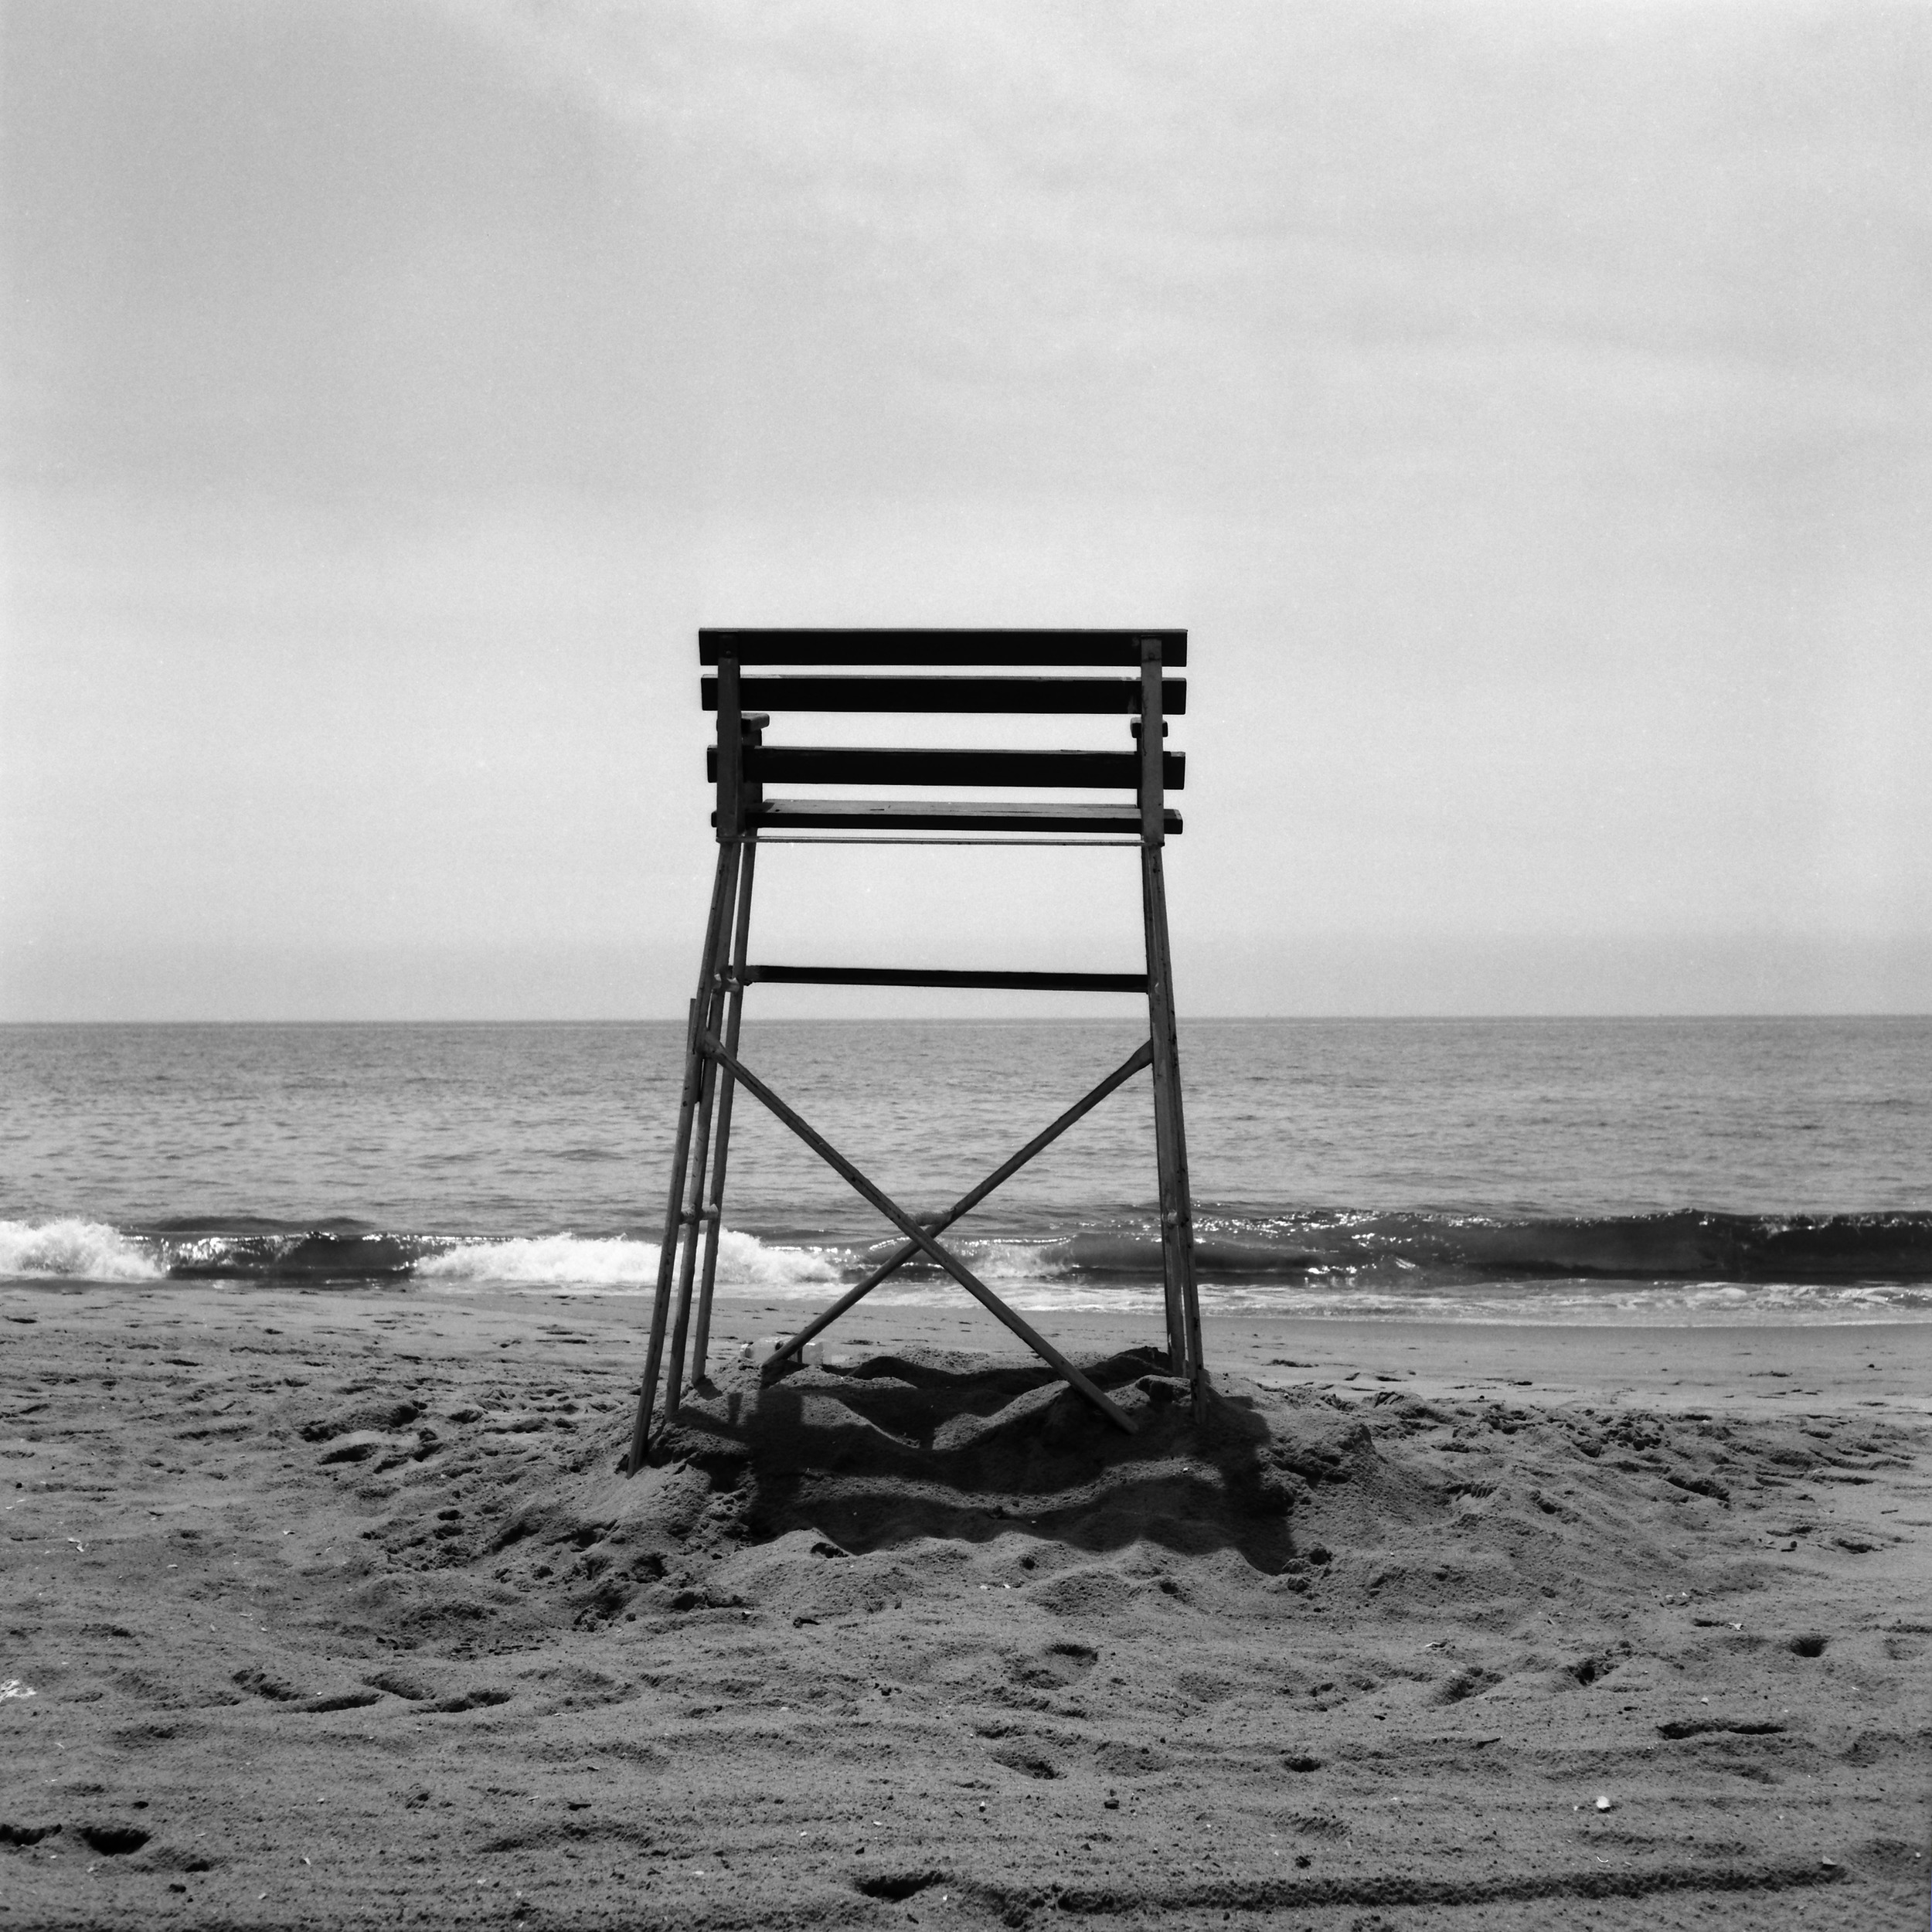 Lifeguard Seat 2012 B&W 120 film Rolleicord